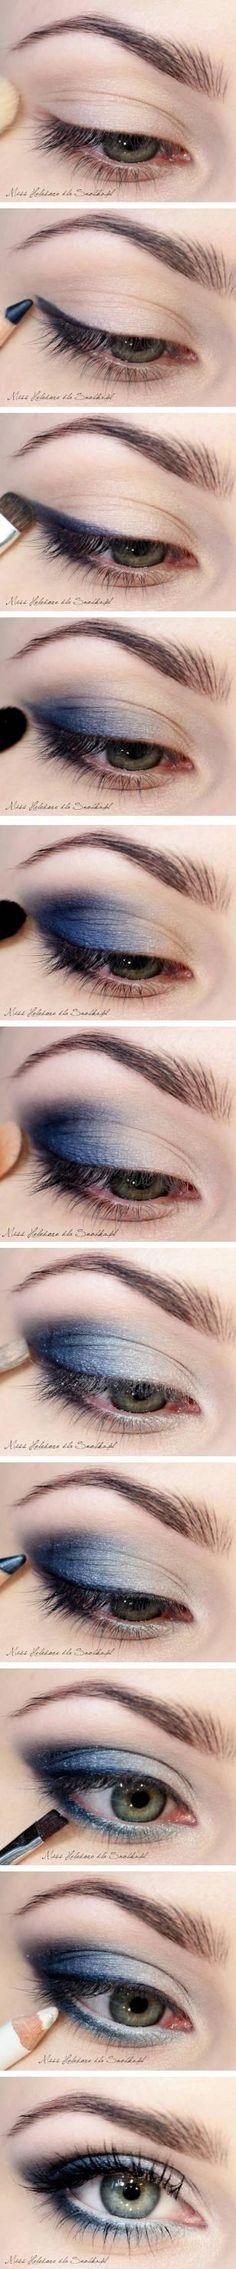 Blue Smokey Eye : For upcominng Urban Girl Culture Shoot